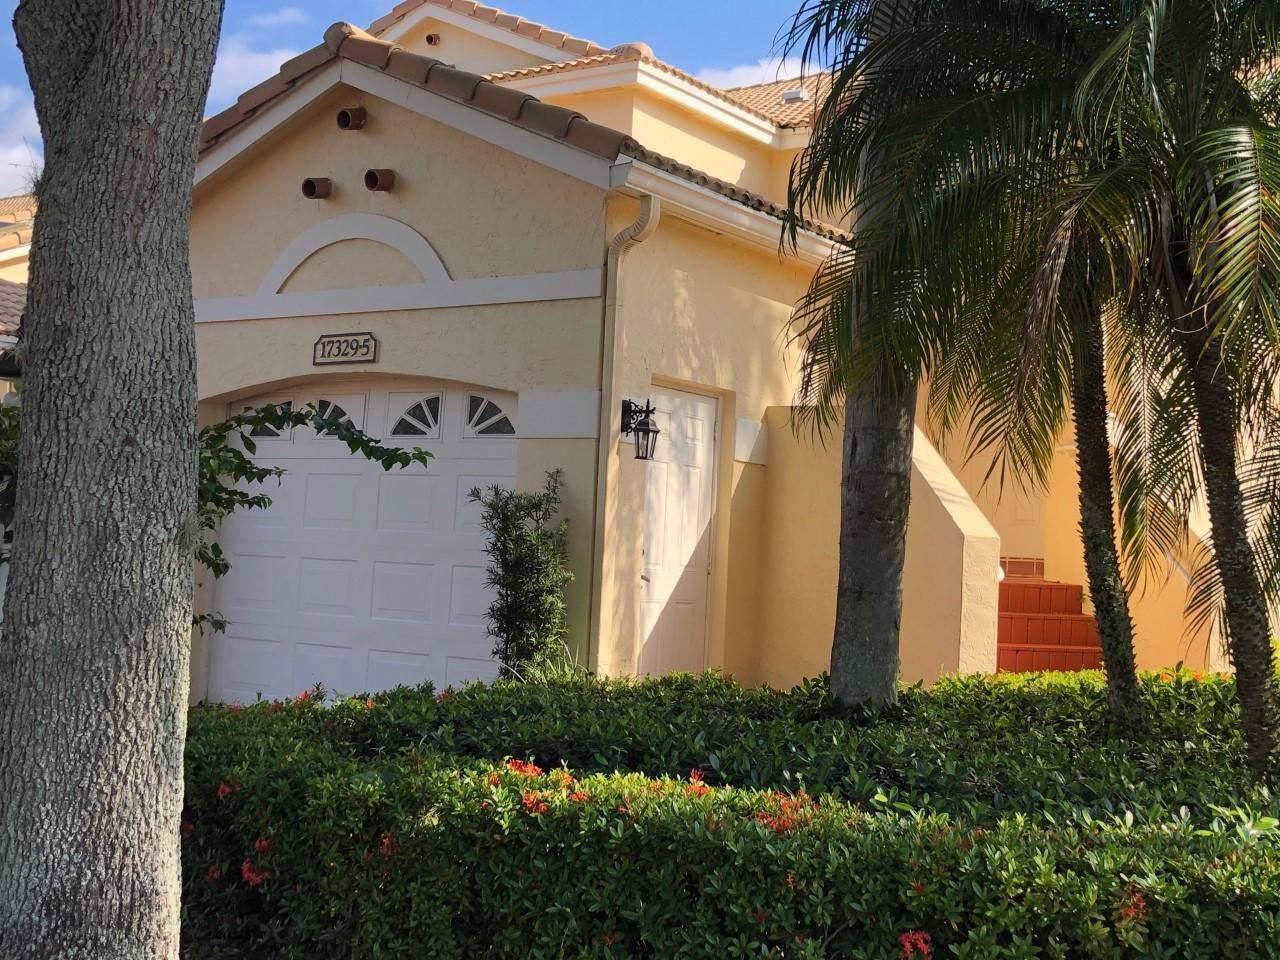 17329 Boca Club Blvd - Photo 1